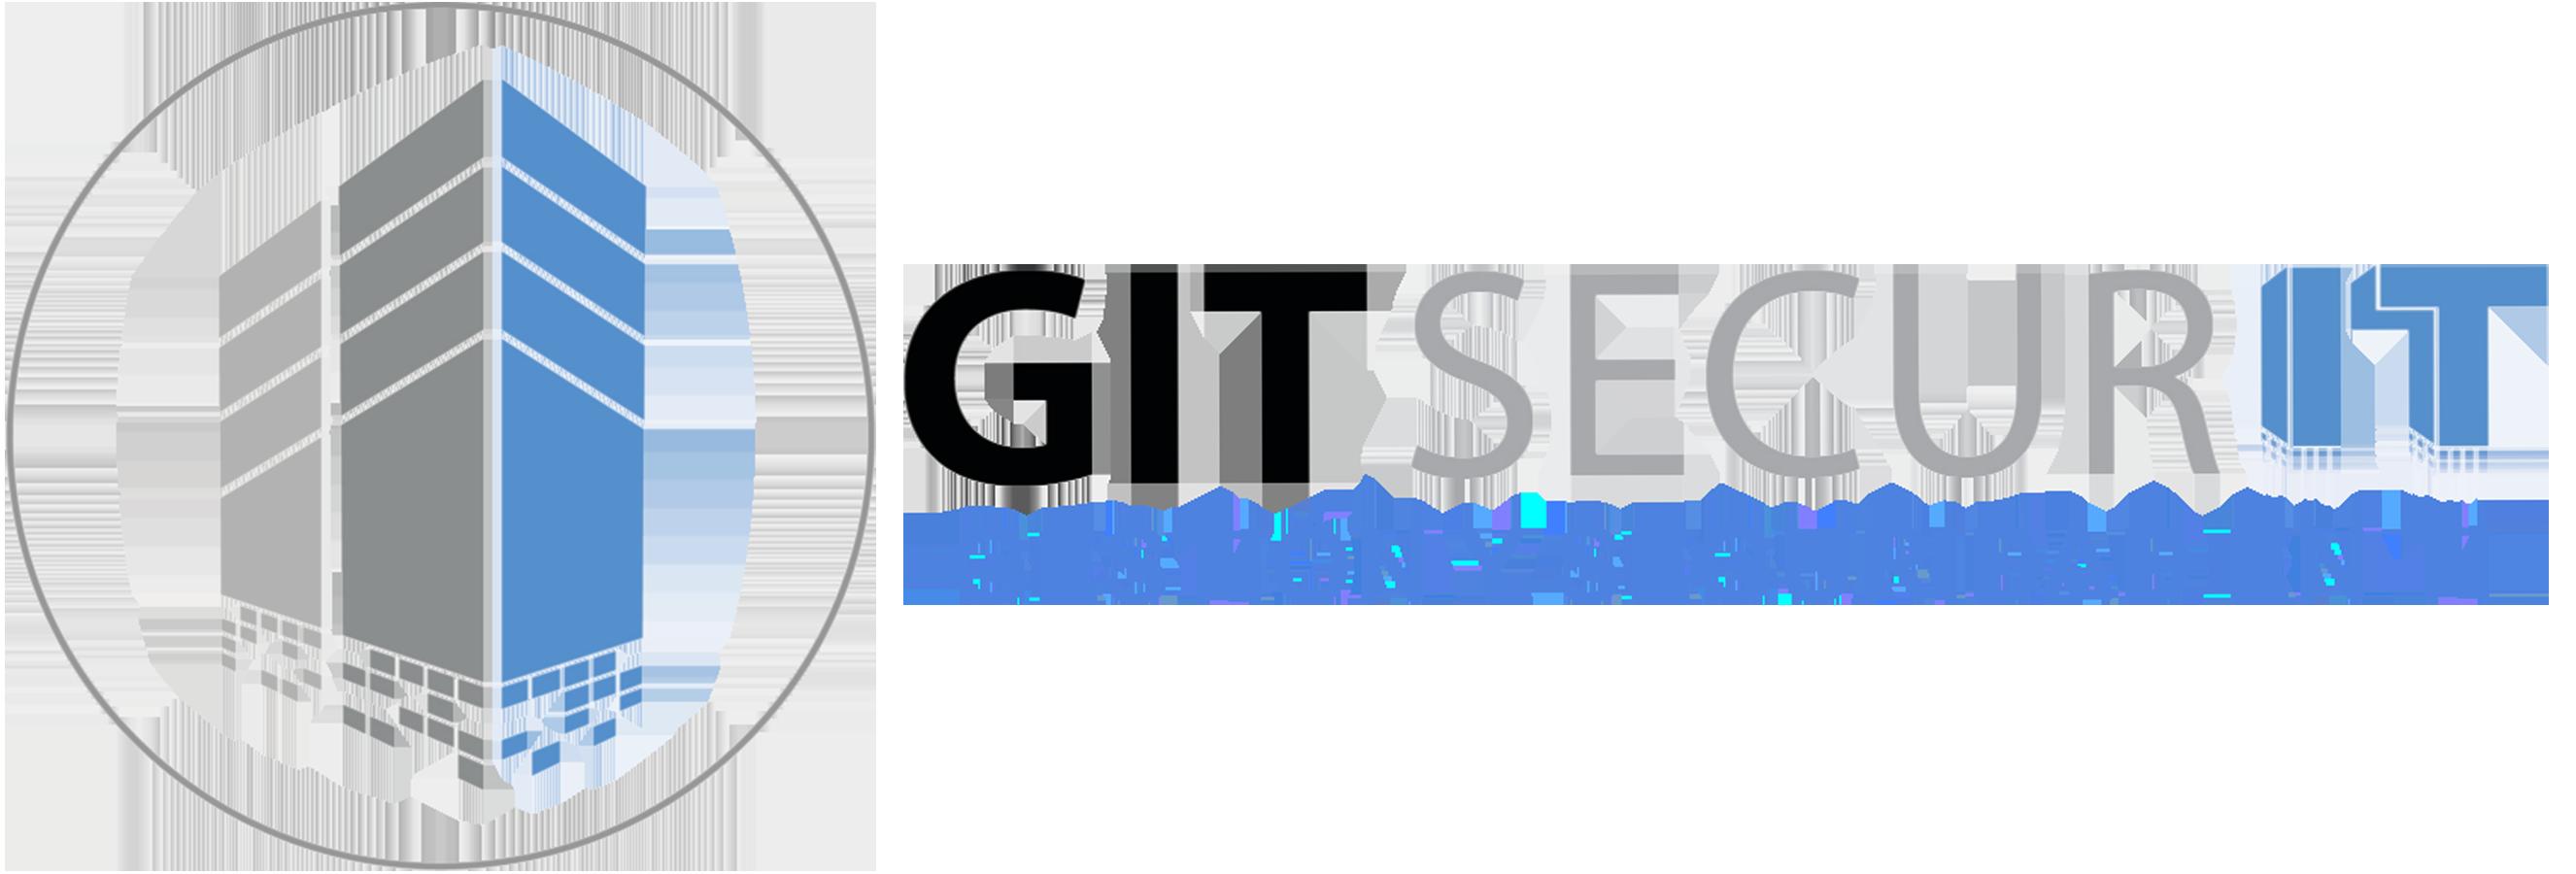 GitSecurit